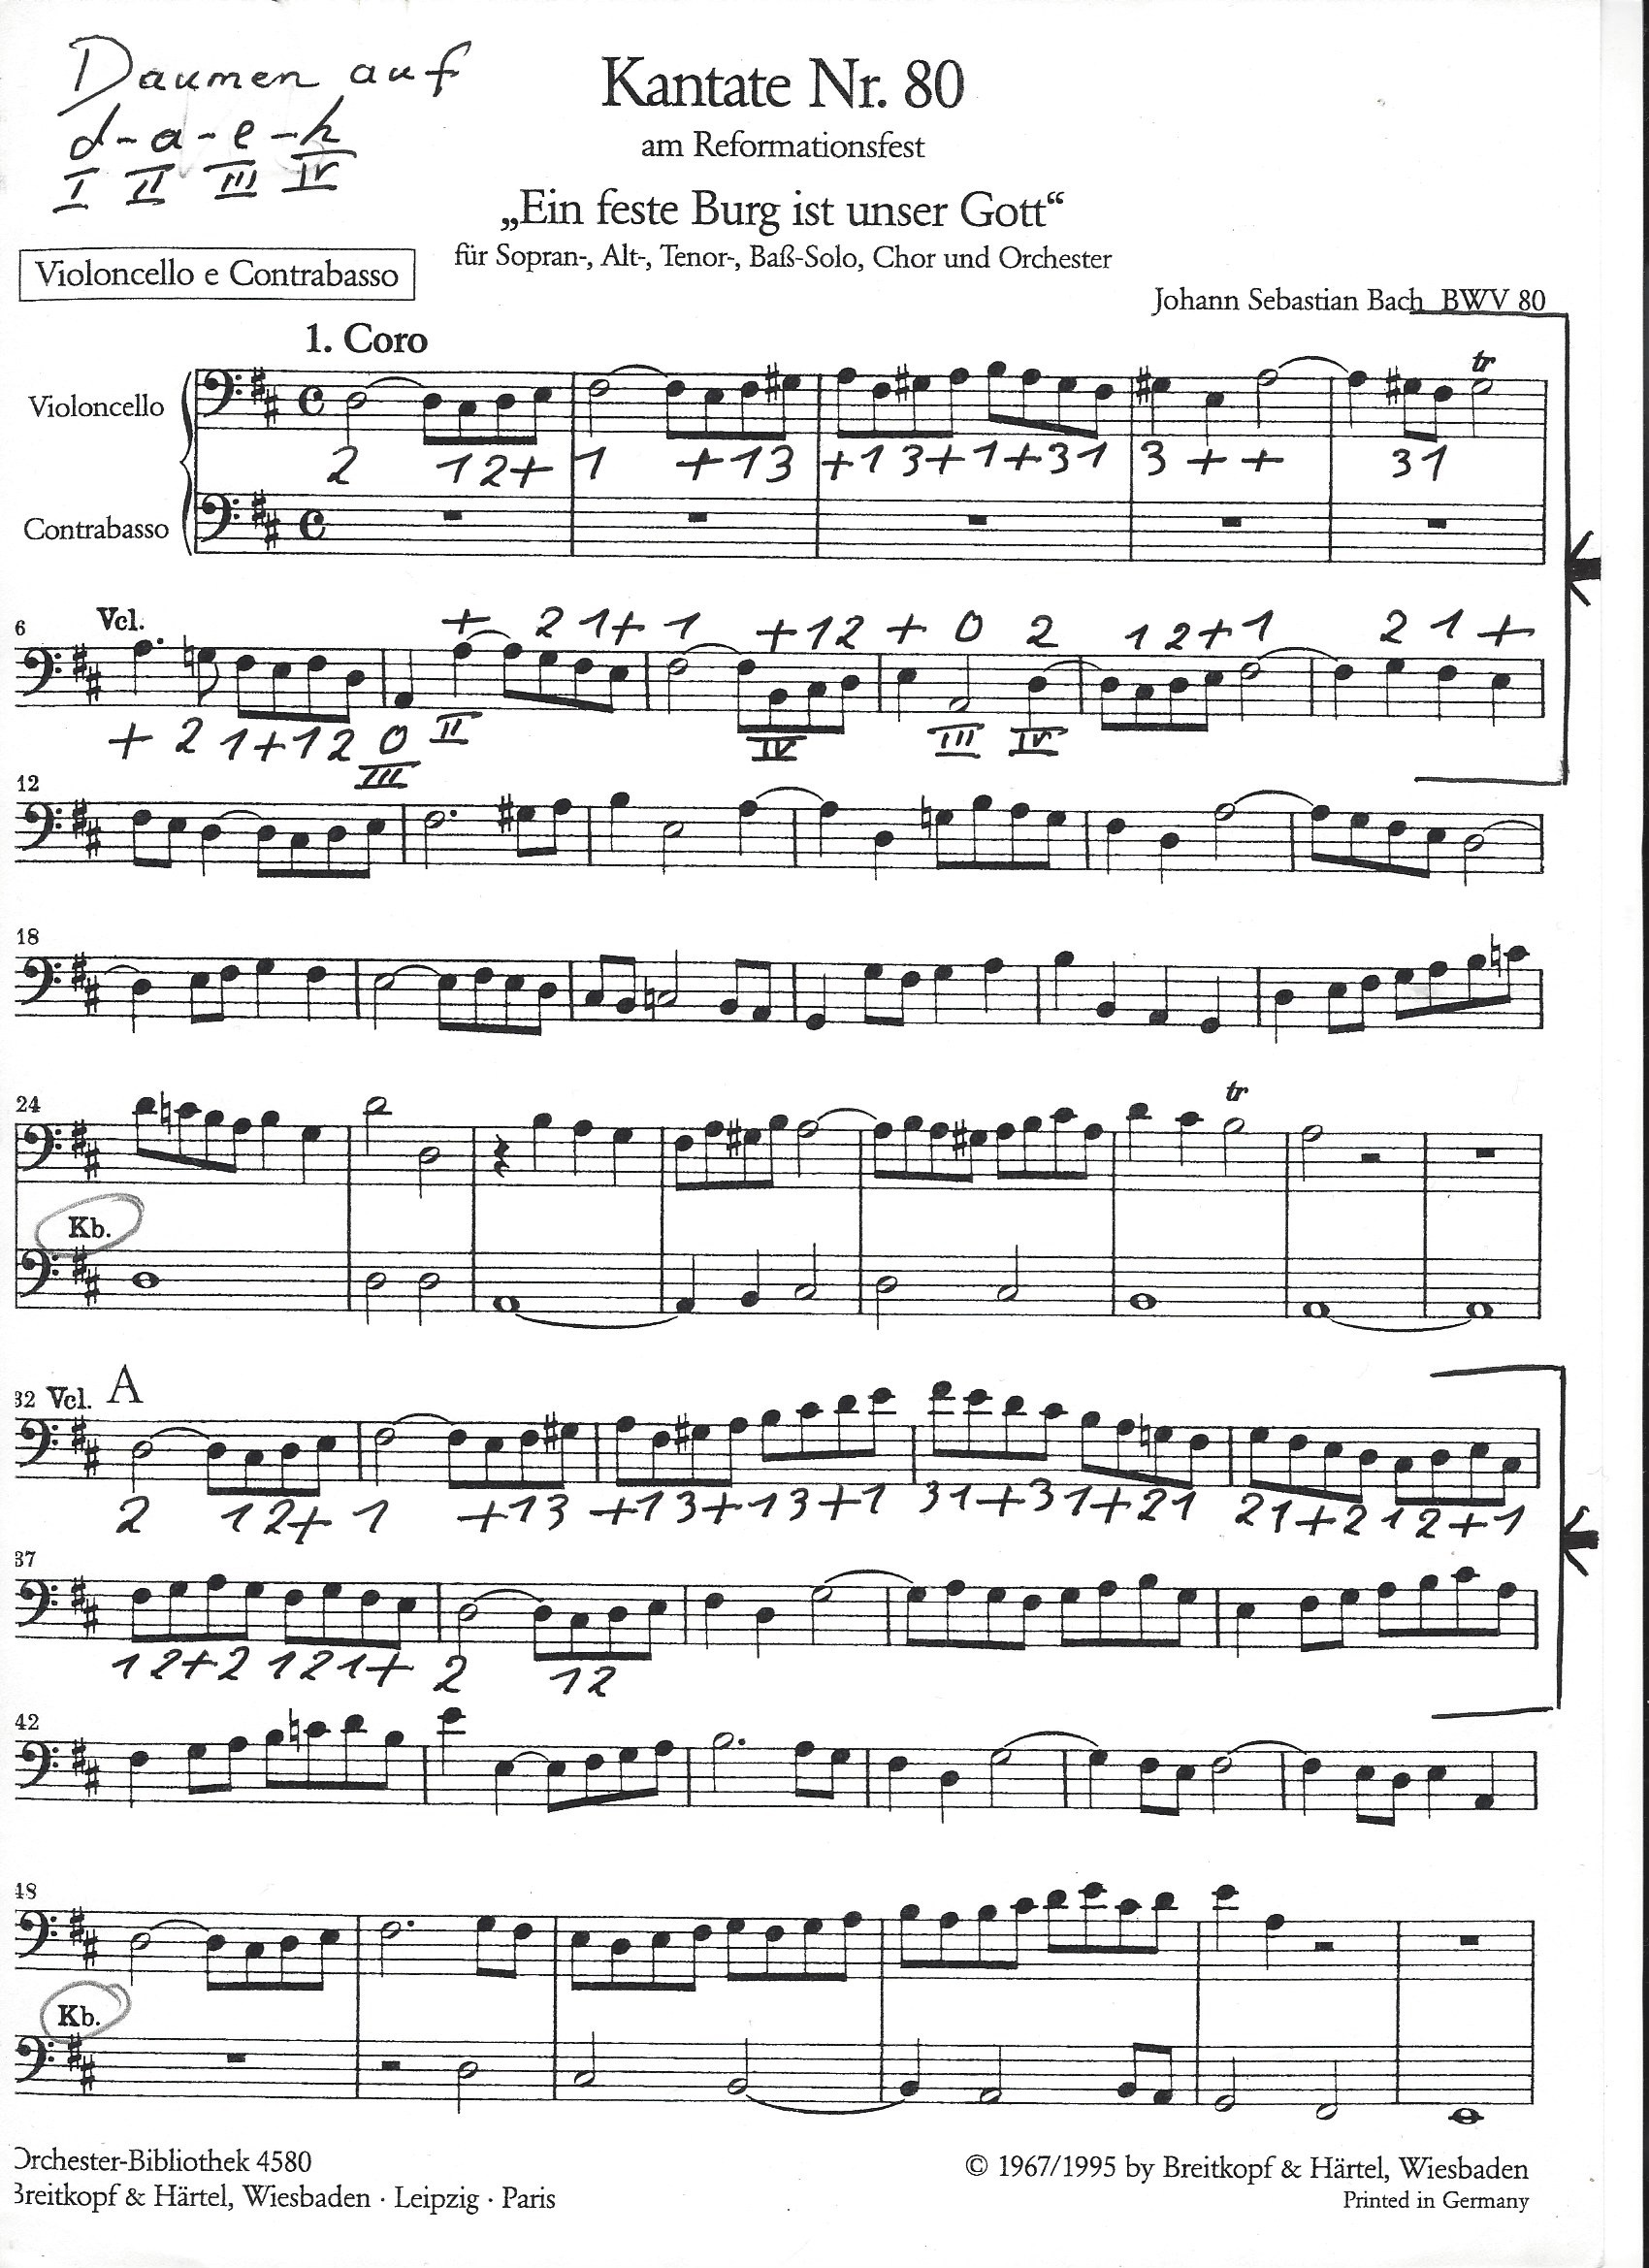 Bach - Orchesterstellen Kantat 80 - Ouvertüre